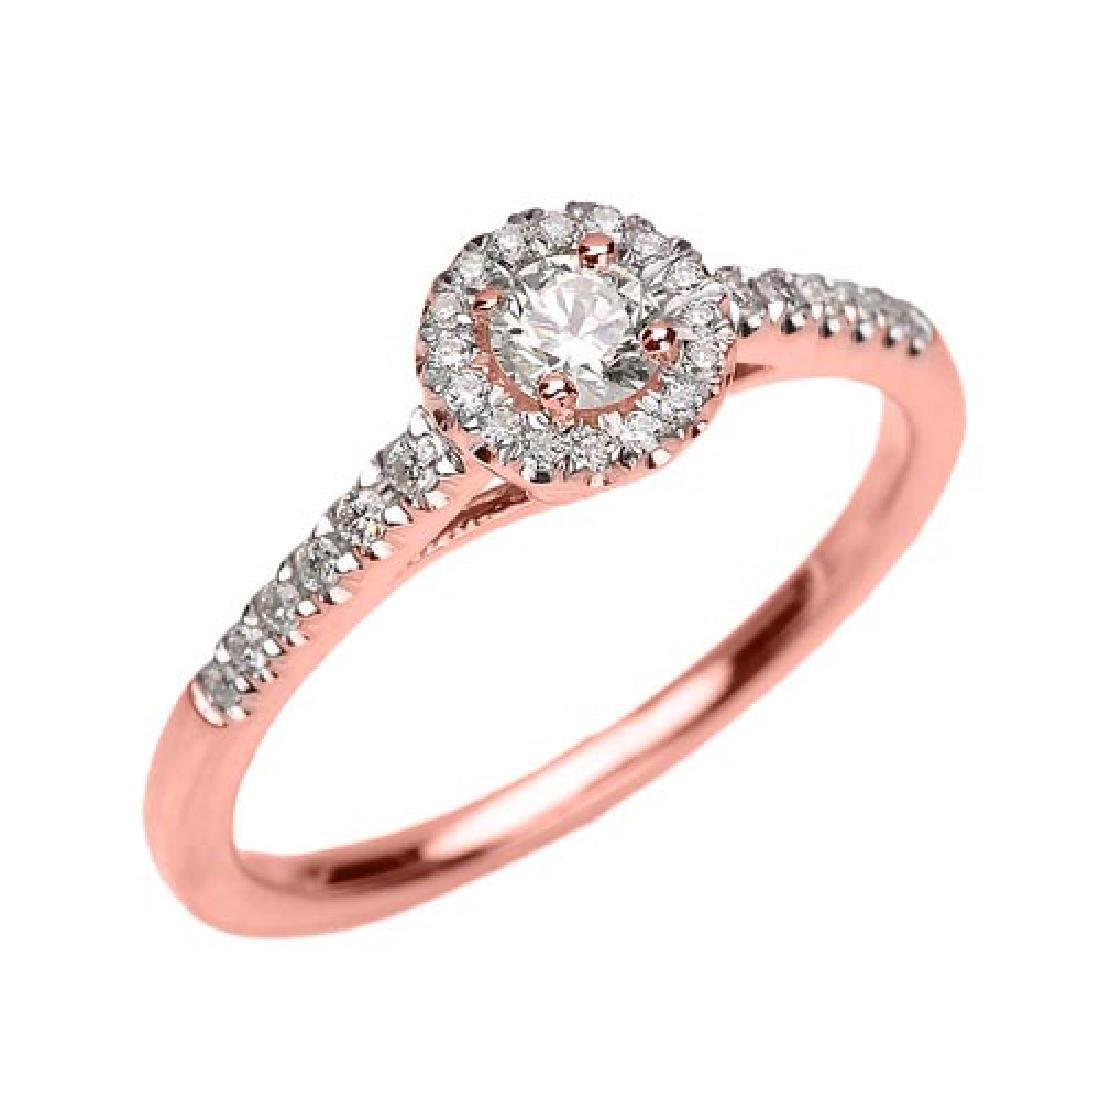 14k Rose Gold Diamond and White Topaz Dainty Engagement